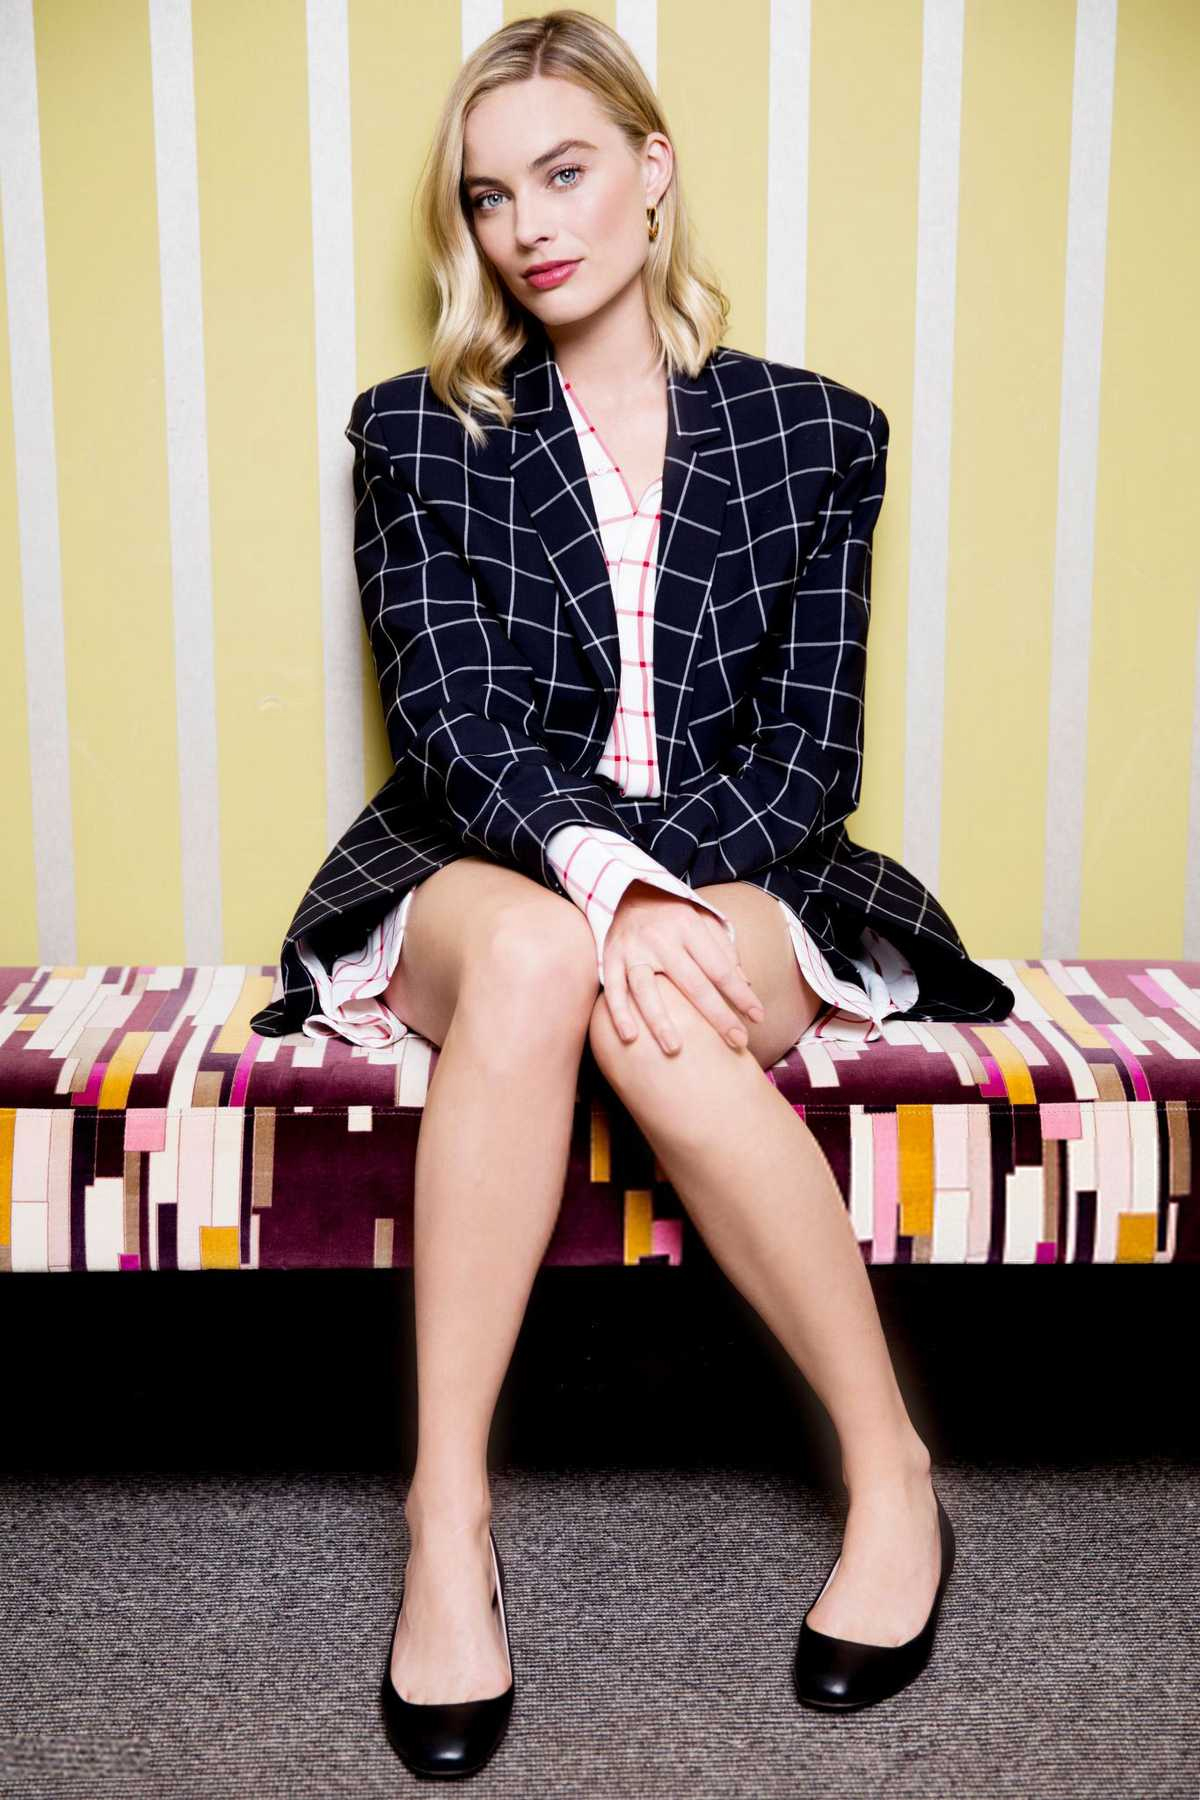 Margot Robbie images Margot Robbie   Sports Illustrated Photoshoot 1200x1800